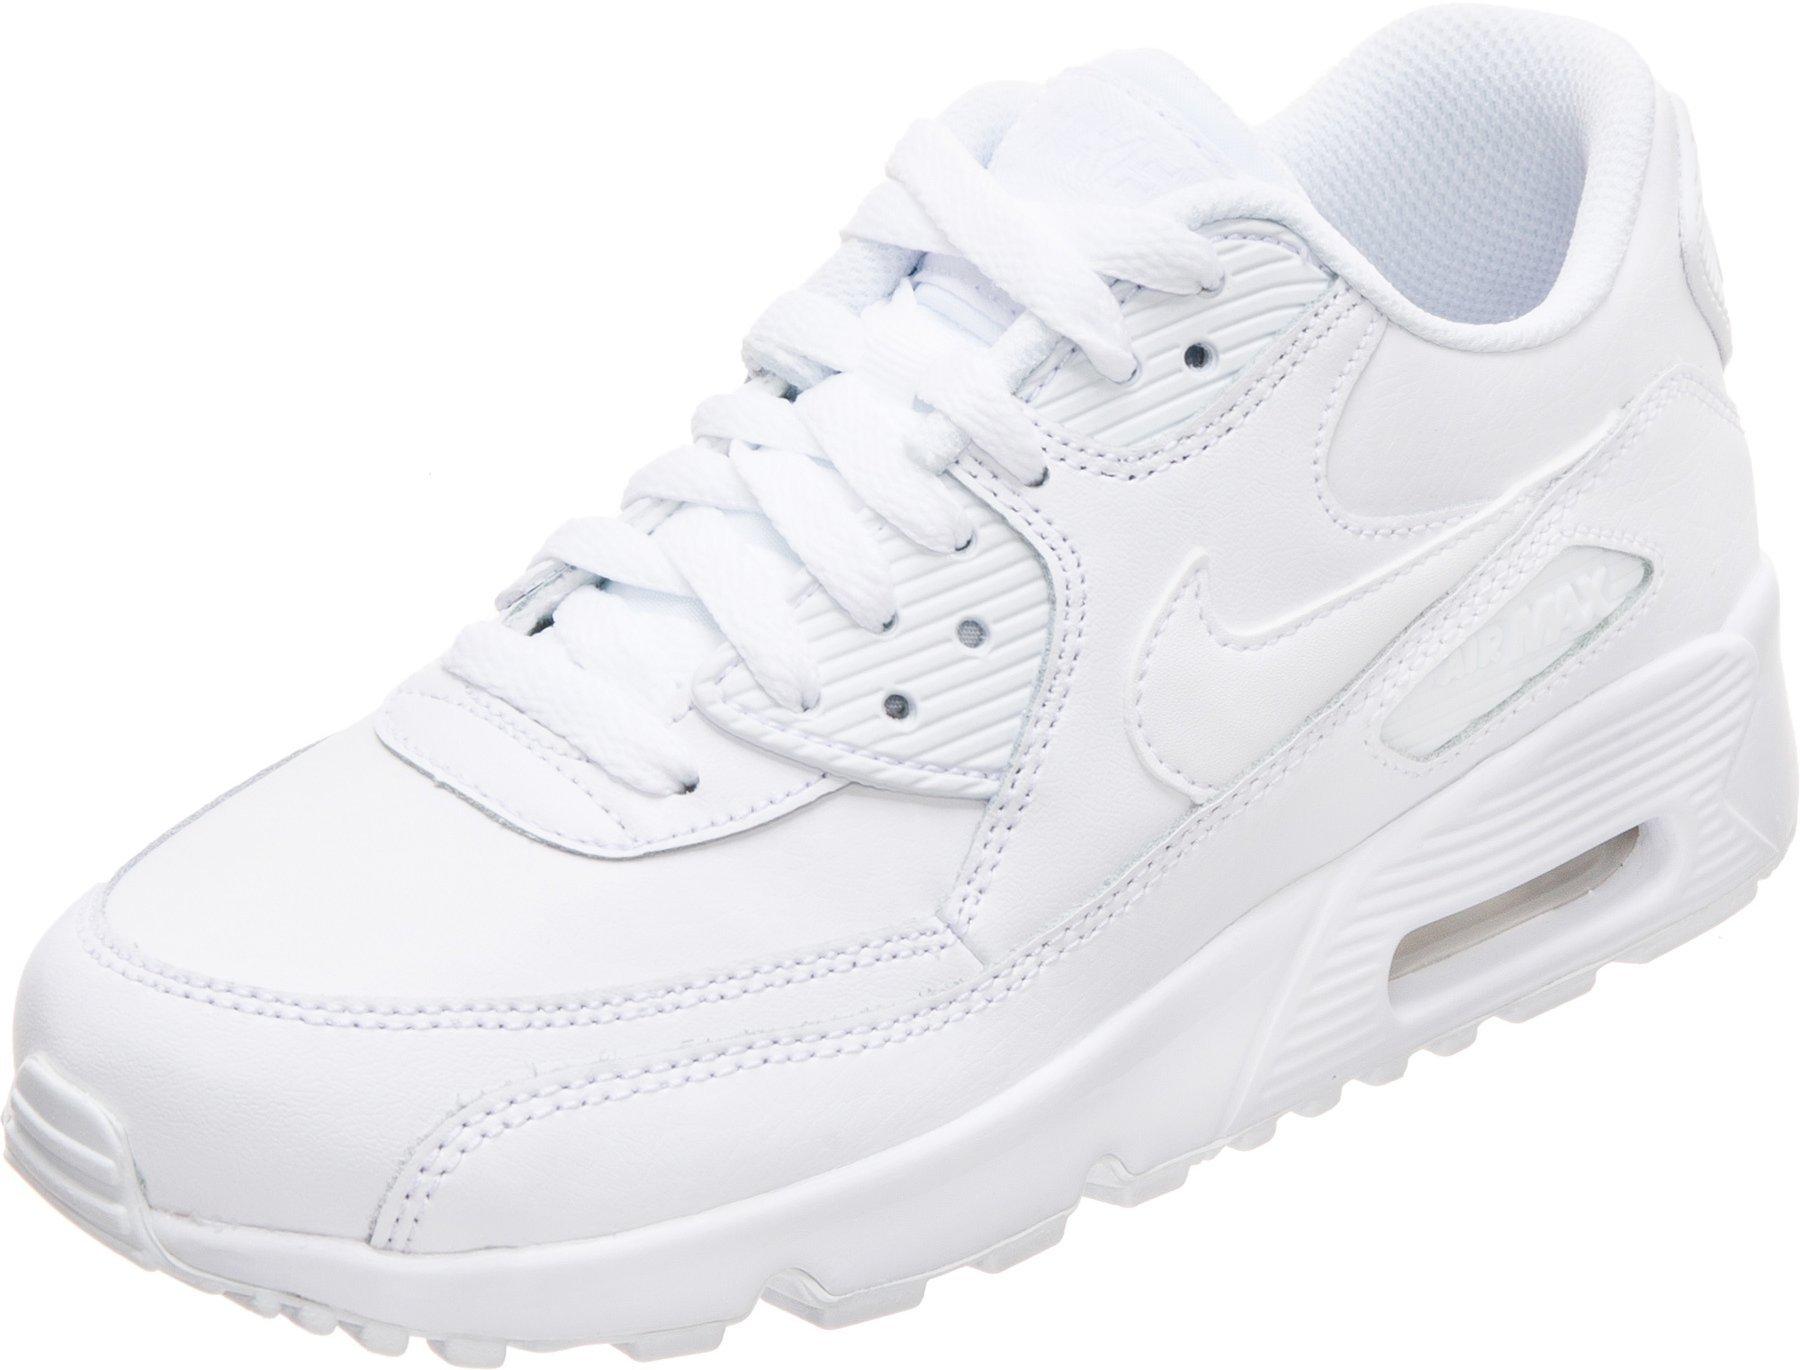 Nike Air Max 90 Leather GS whitewhite